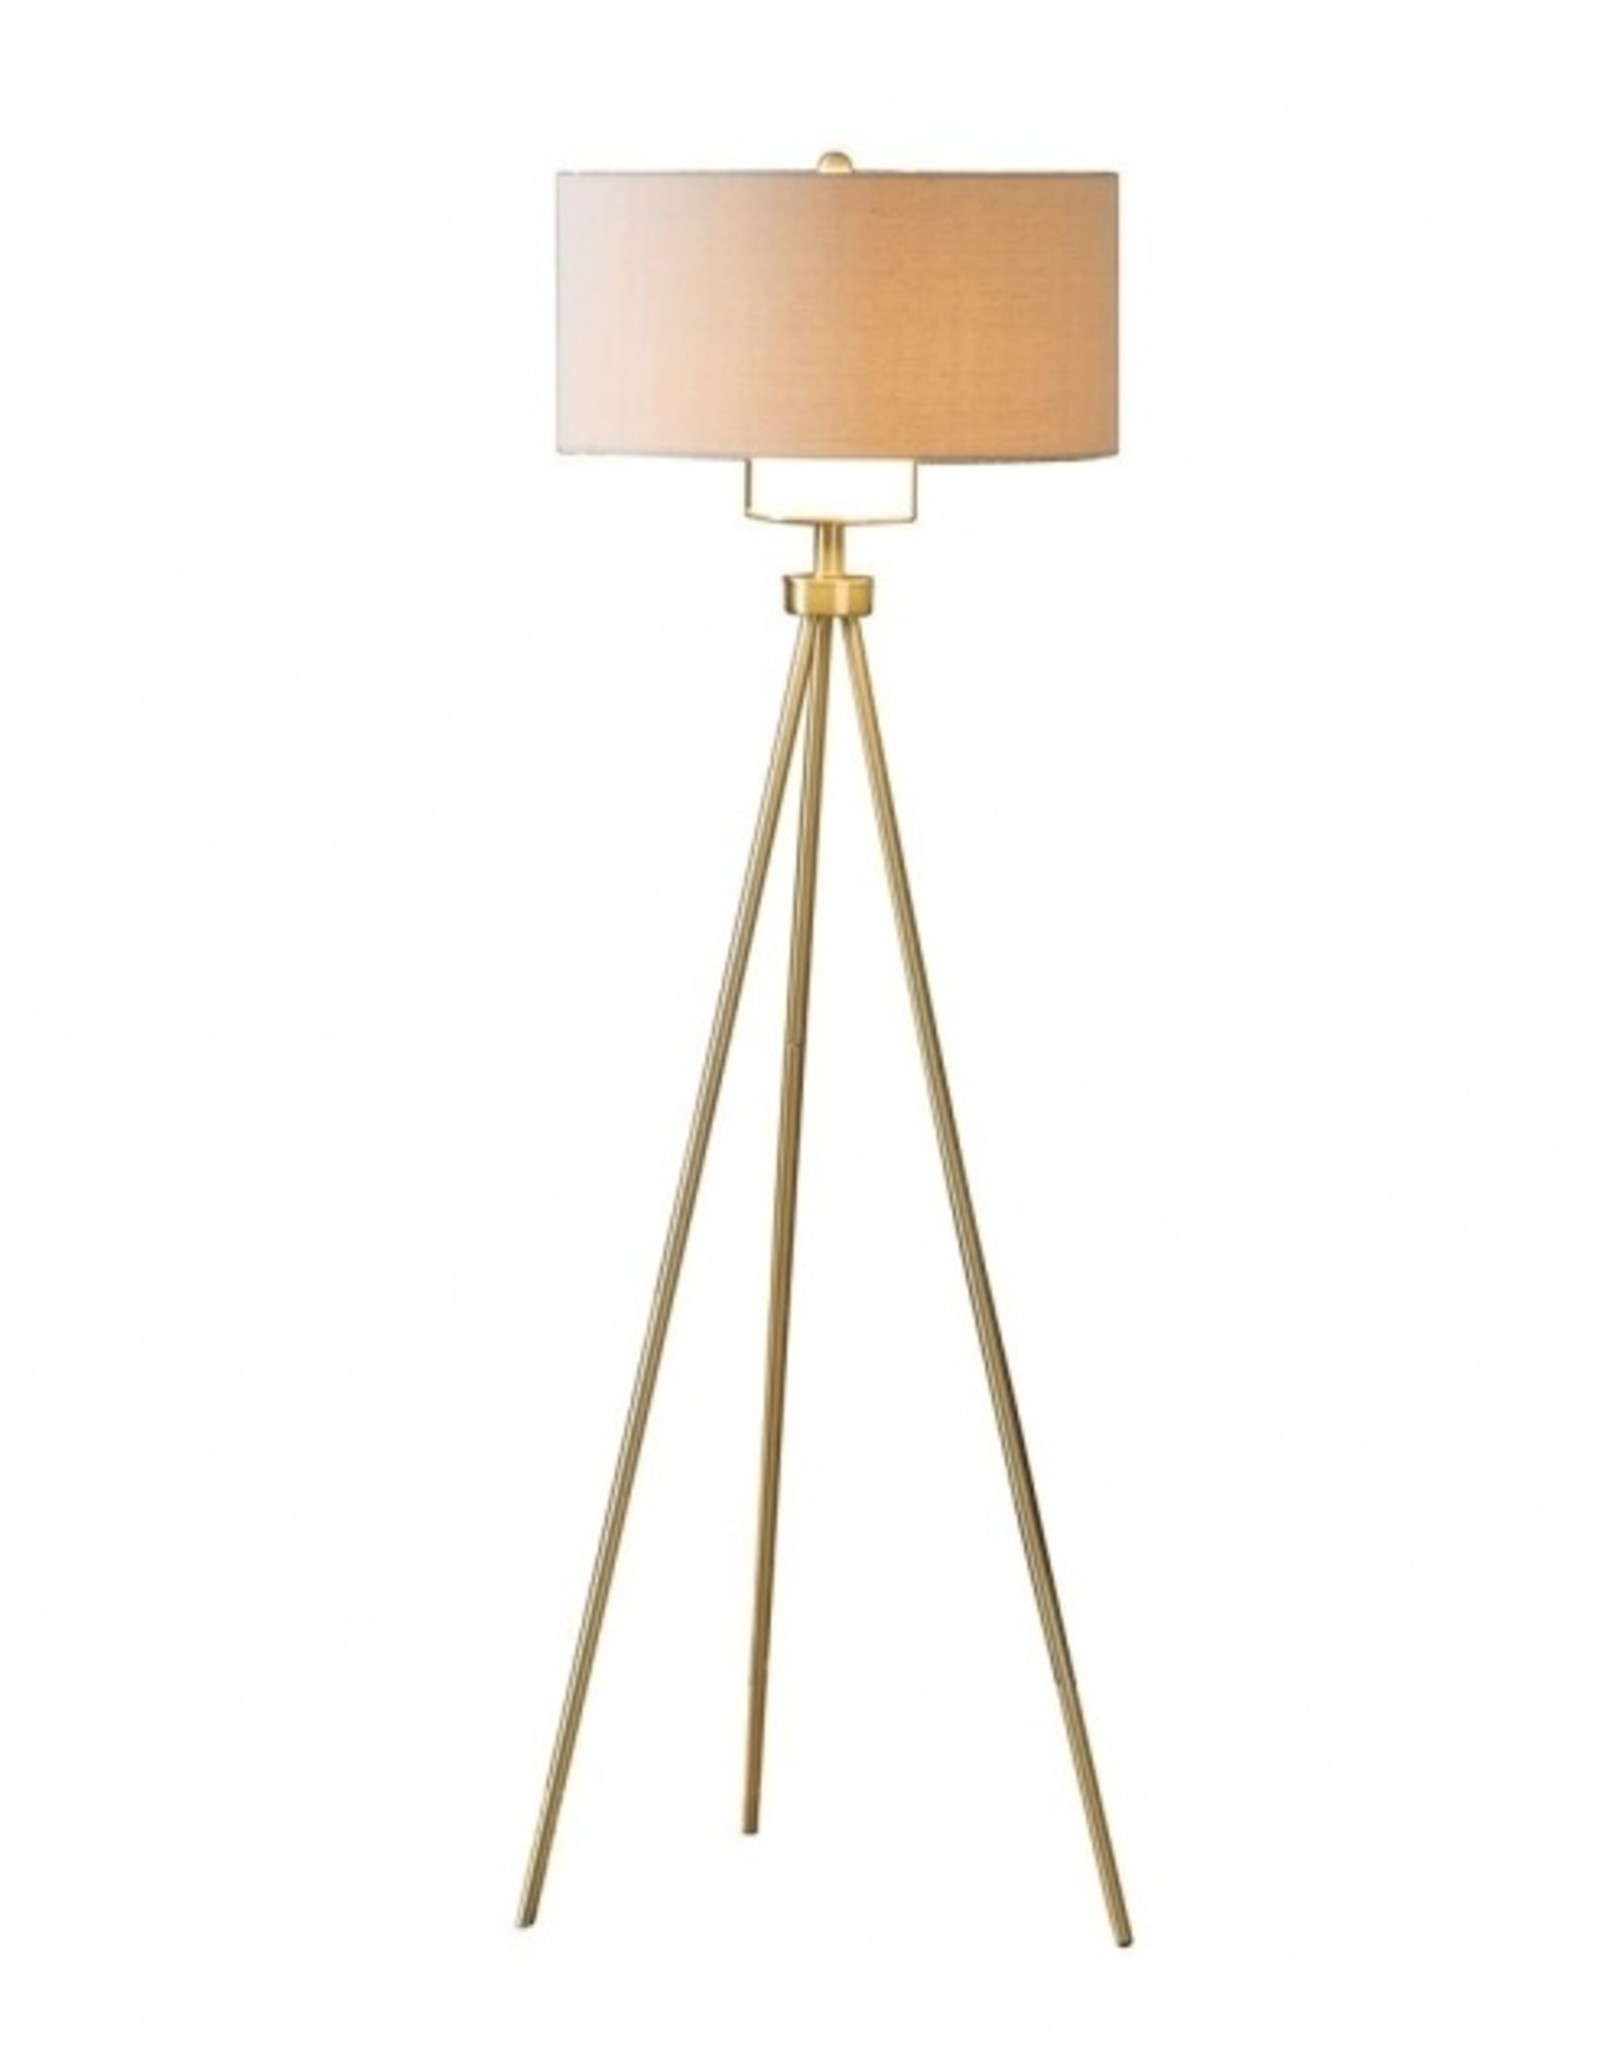 Crownmark Gold Floor Lamp